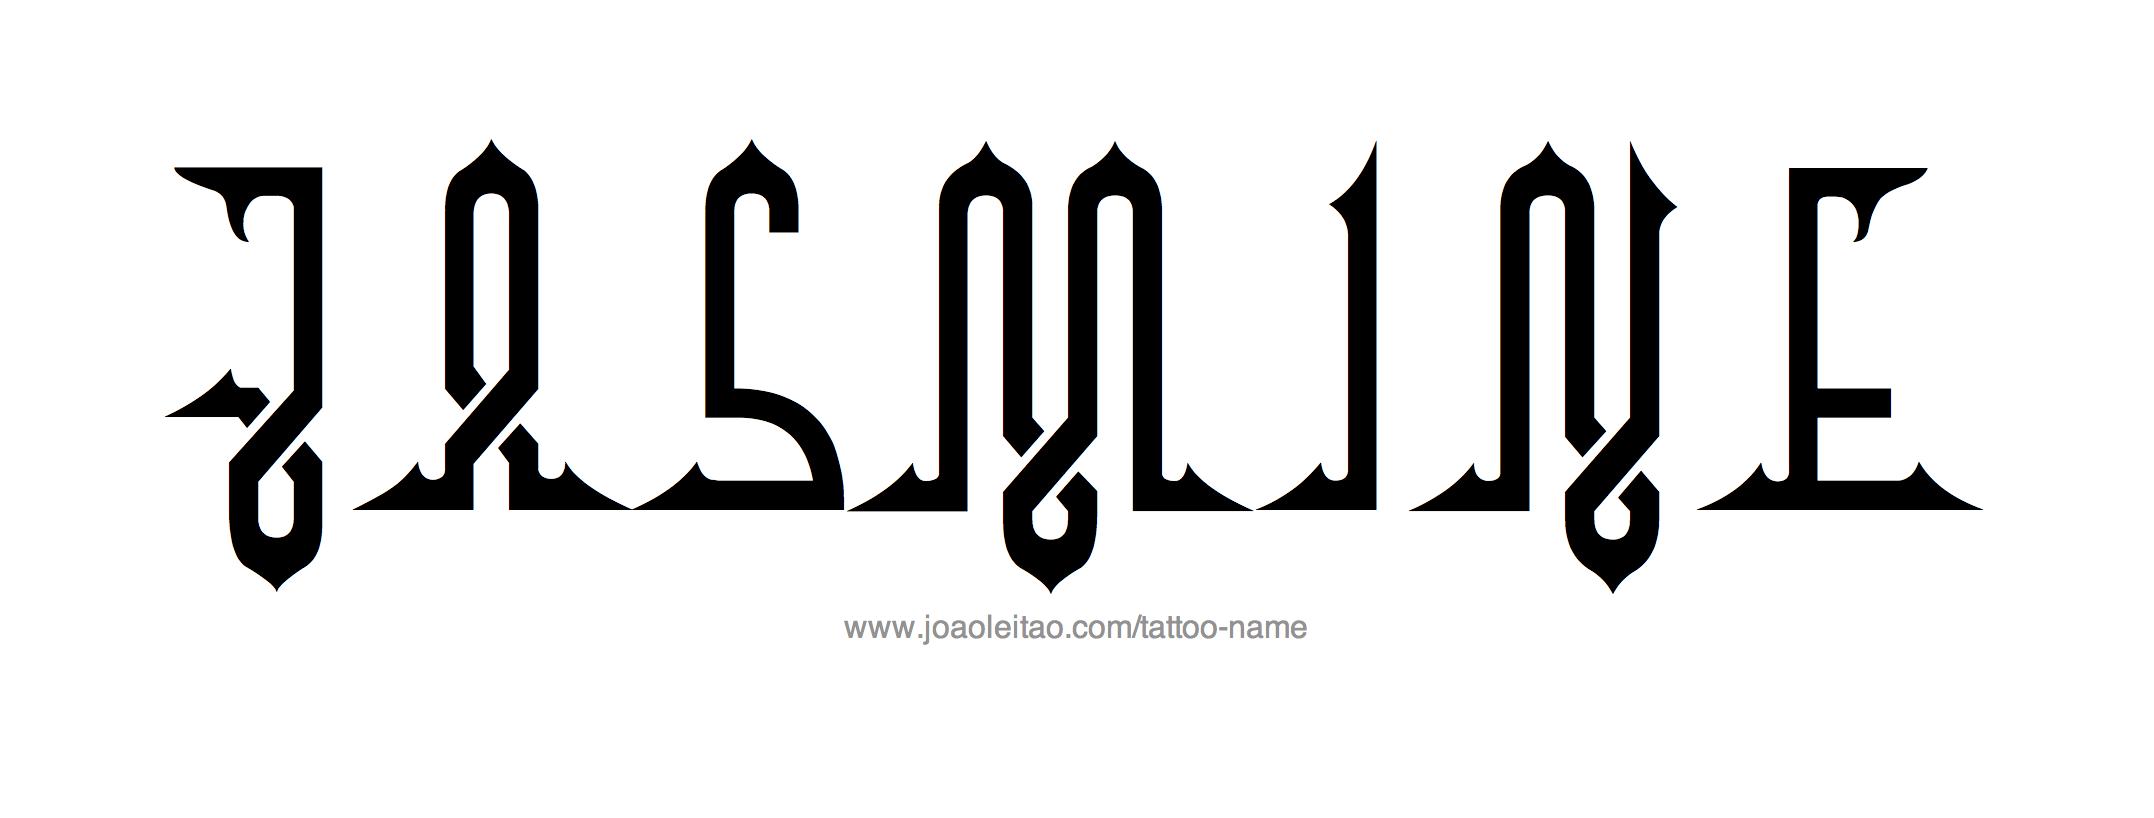 2154x818 Jasmine Name Tattoo Designs